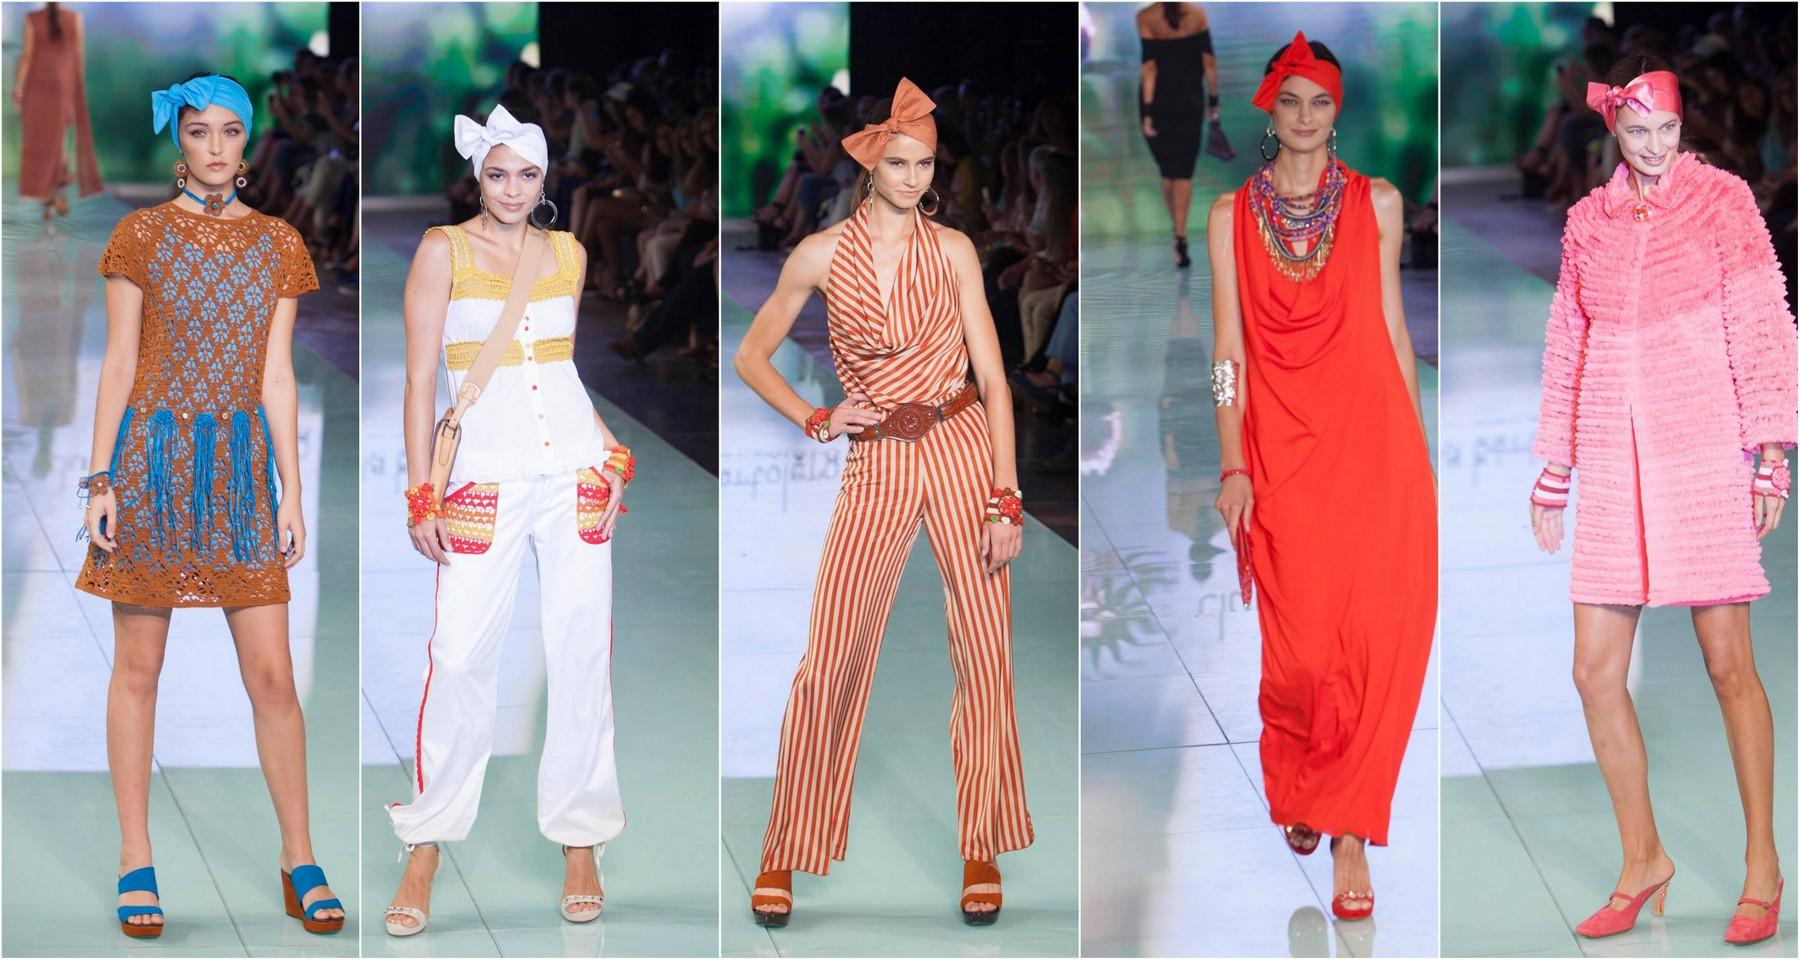 Miami Fashion Week 2016: Claudia Bertolero